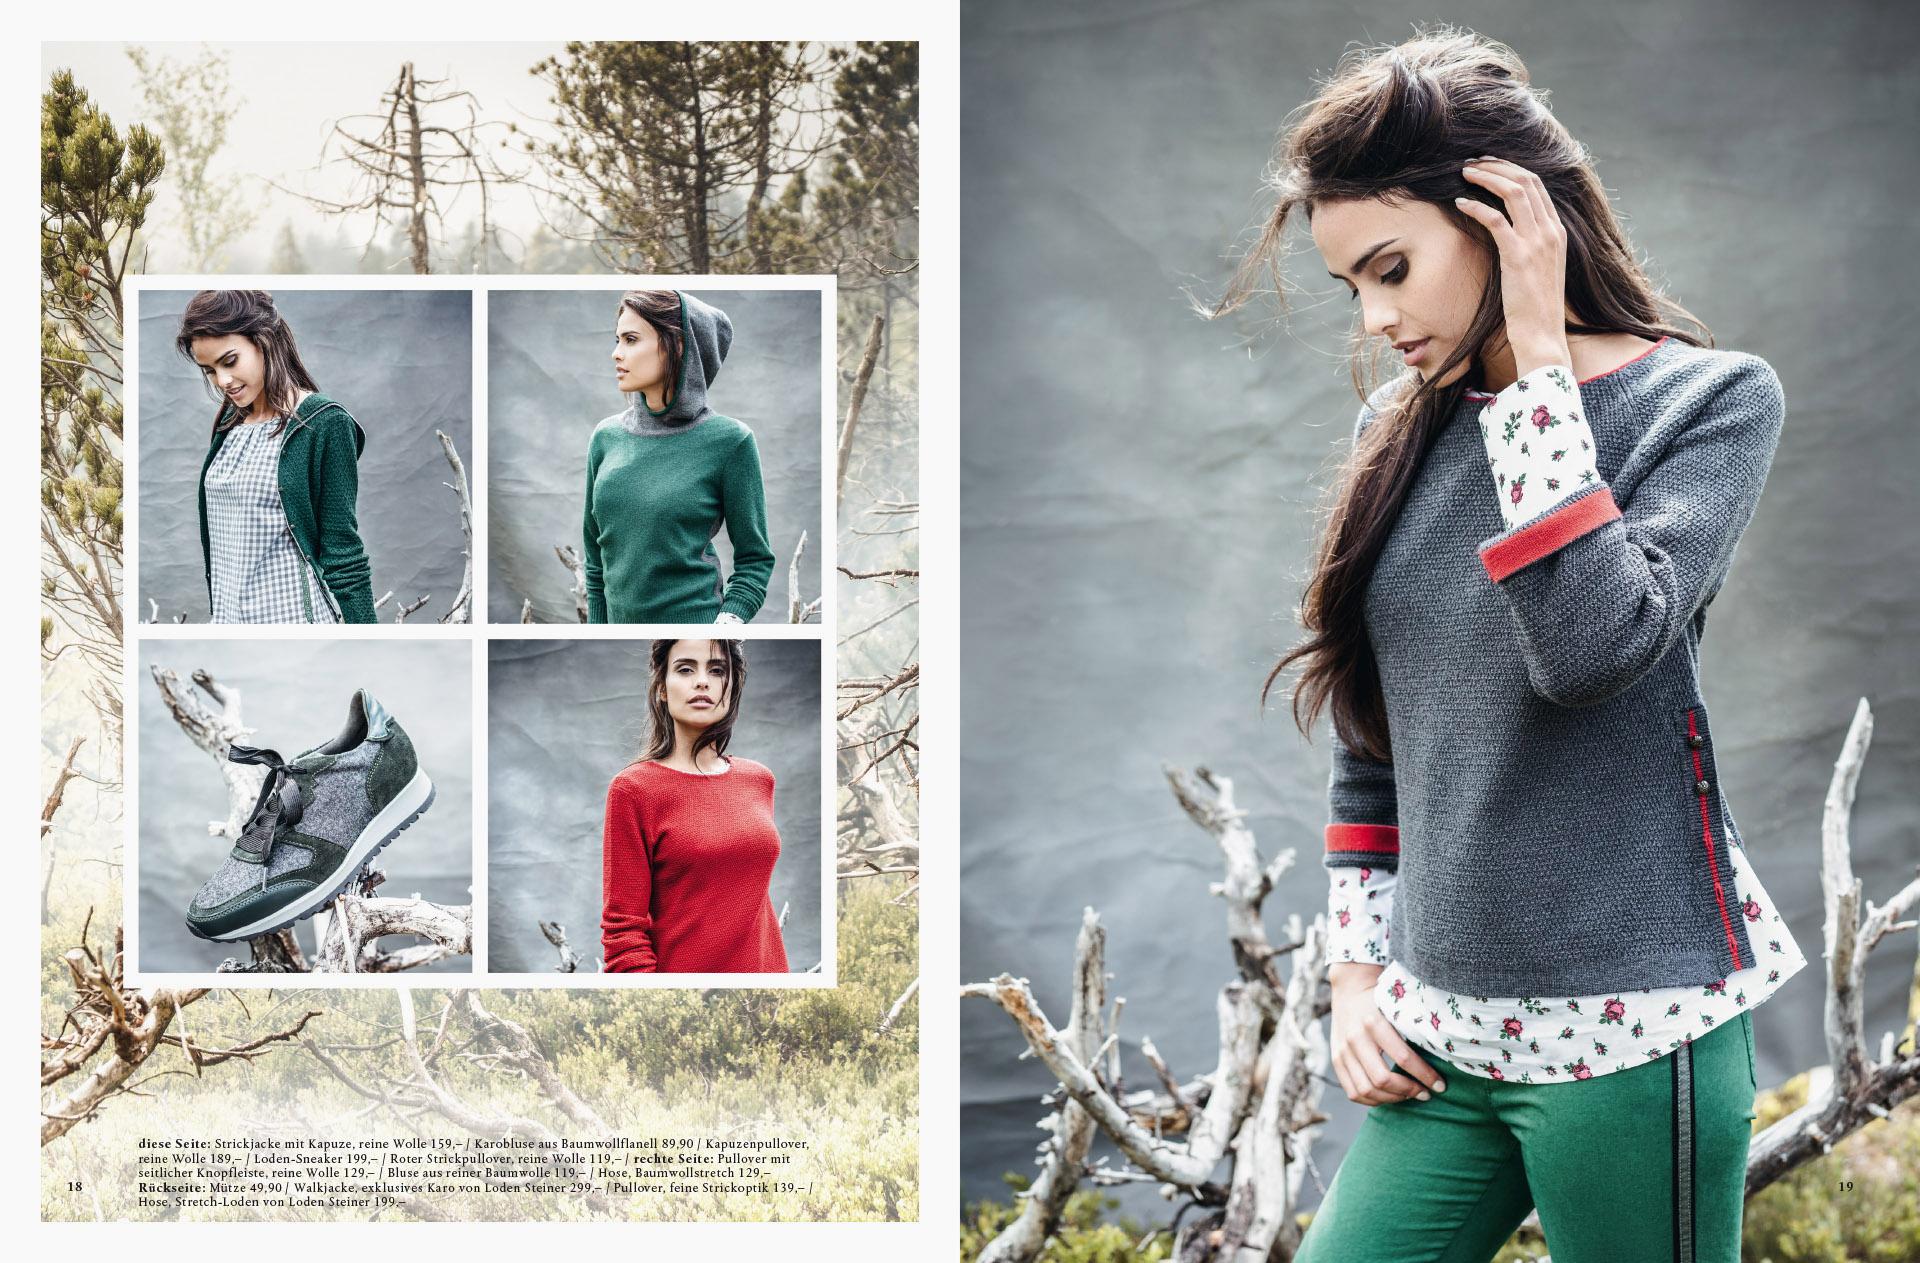 Fotowerk Modefotografie - Outfits in verschieden Farben